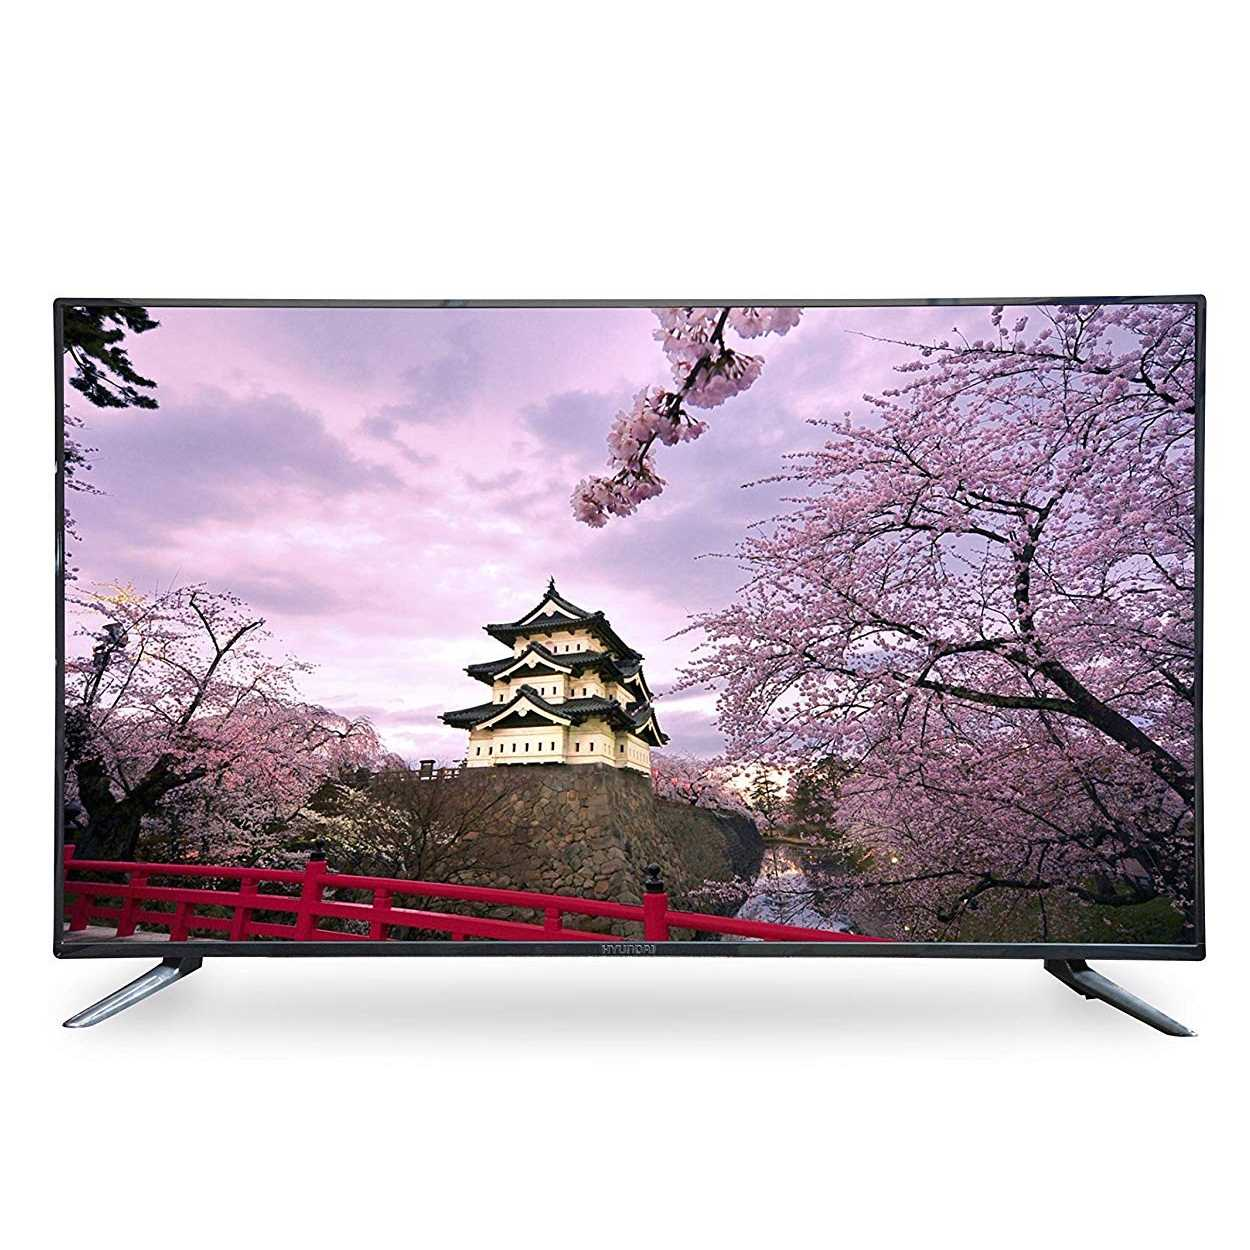 Hyundai HY5585Q4Z25 55 Inch 4K Ultra HD Smart LED Television